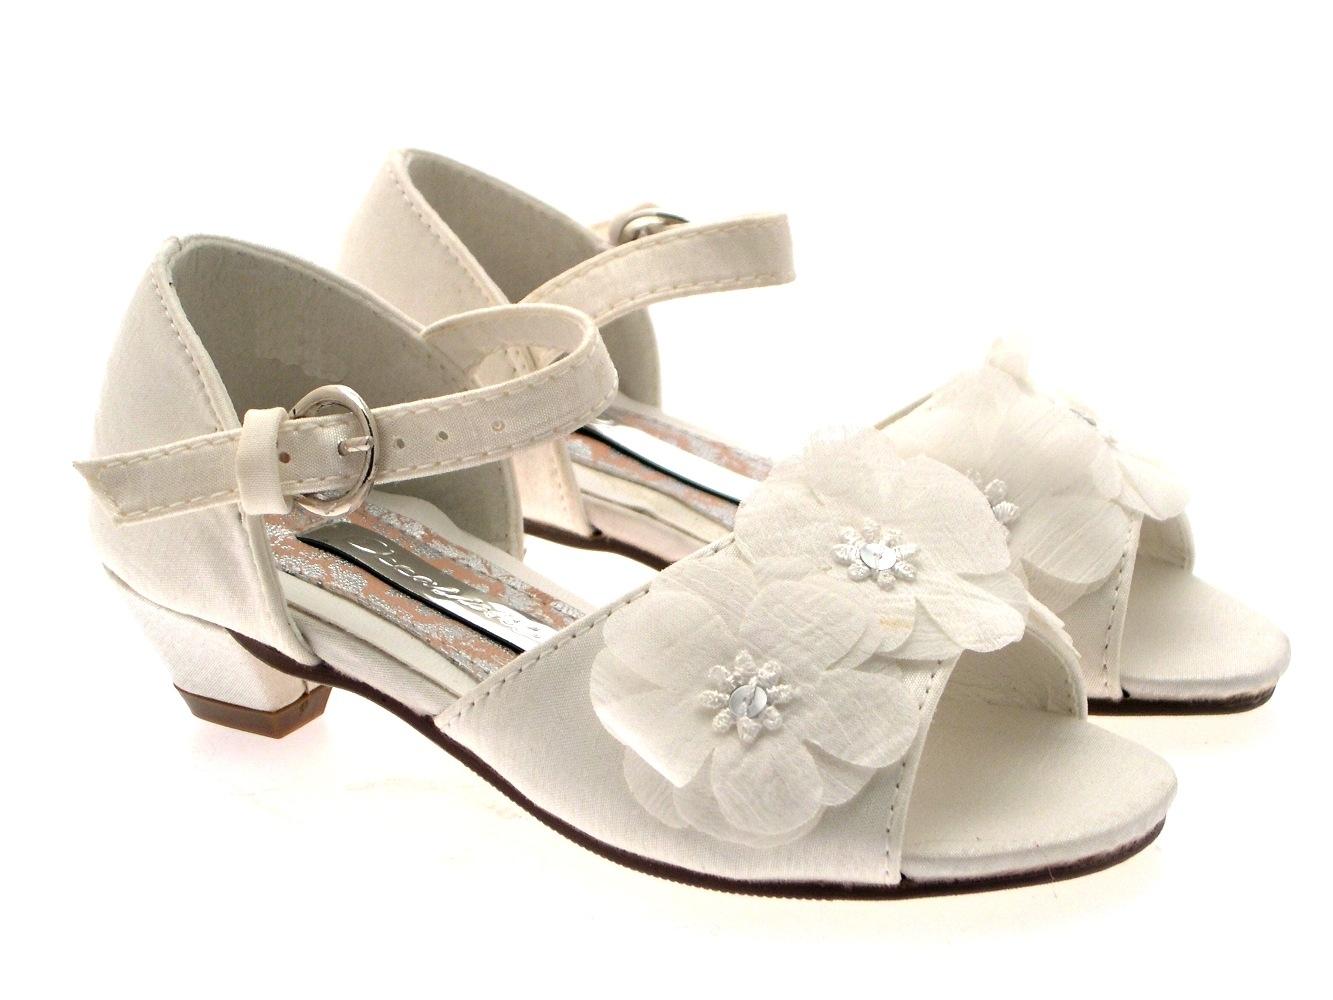 GIRLS KIDS SATIN FLOWER WEDDING BRIDAL BRIDESMAID IVORY